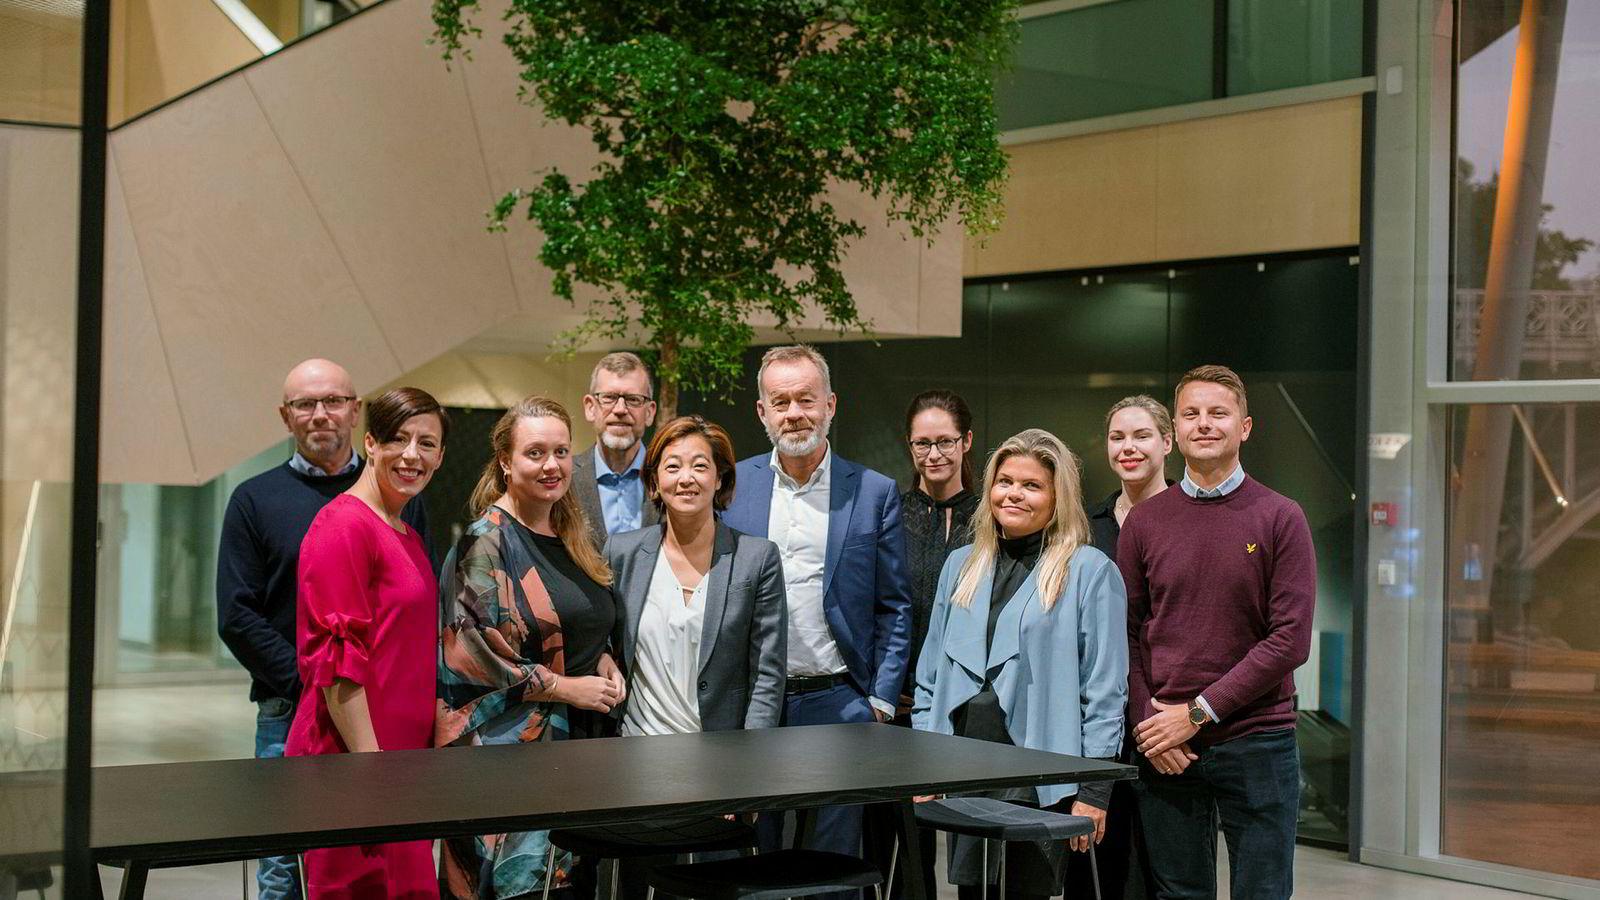 Fra venstre: Bjarne D. Erichsen, Ingeborg Volan, Julie Lundgren, Kjetil B. Alstadheim, Hege Kosberg, Amund Djuve, Janne Johannessen, Tinna Gudmundsdottir, Live F. Thorsen, Fredrik Loennecken.